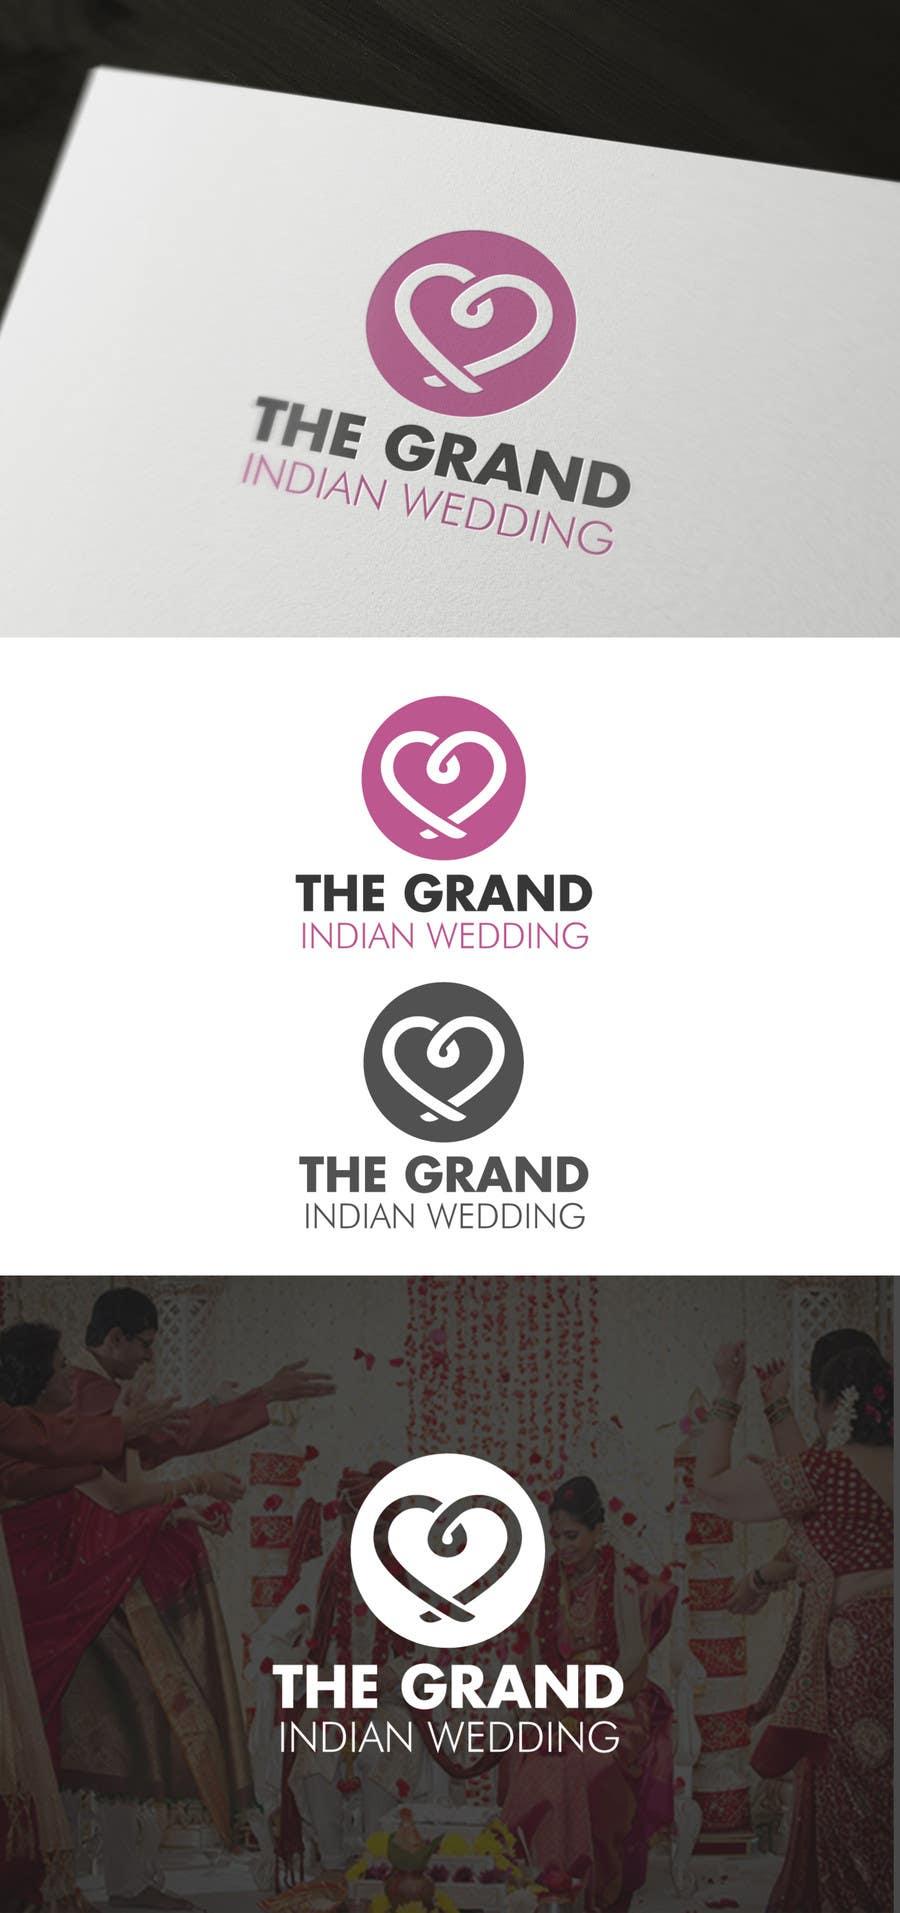 Konkurrenceindlæg #34 for Design a Logo for a destination wedding planning company